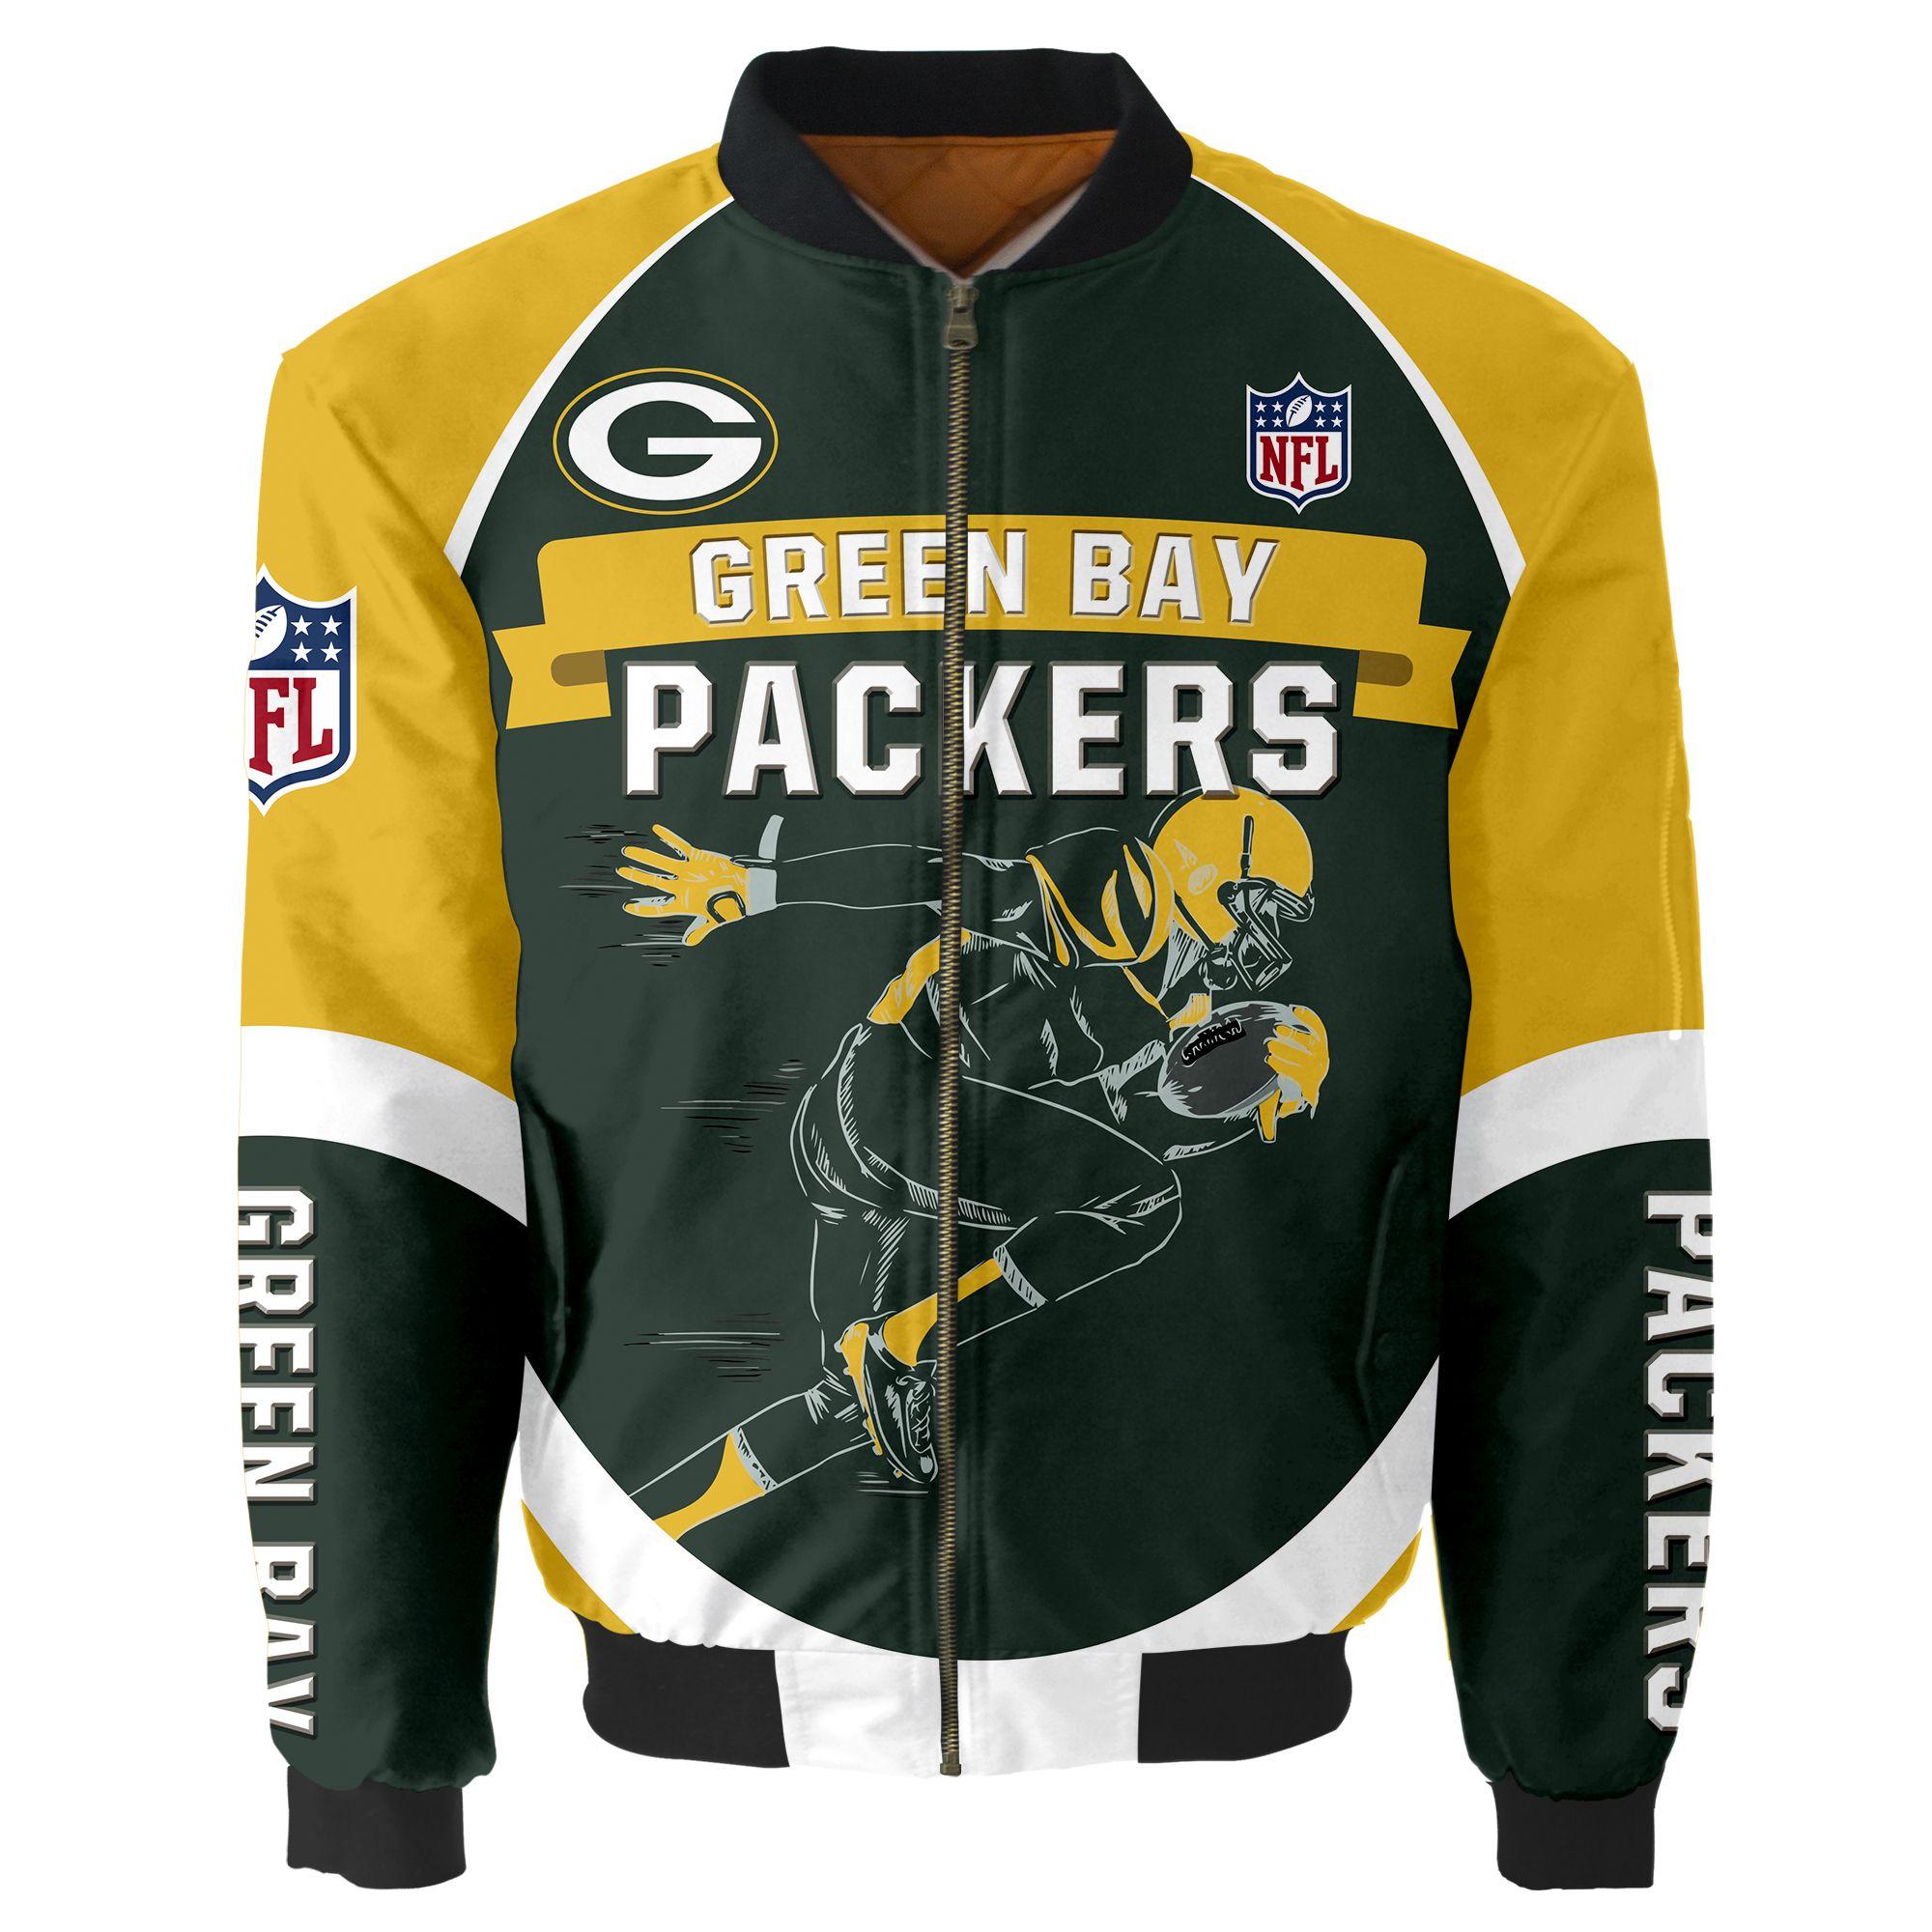 Green Bay Packers Bomber Jacket Men Women CottonPadded